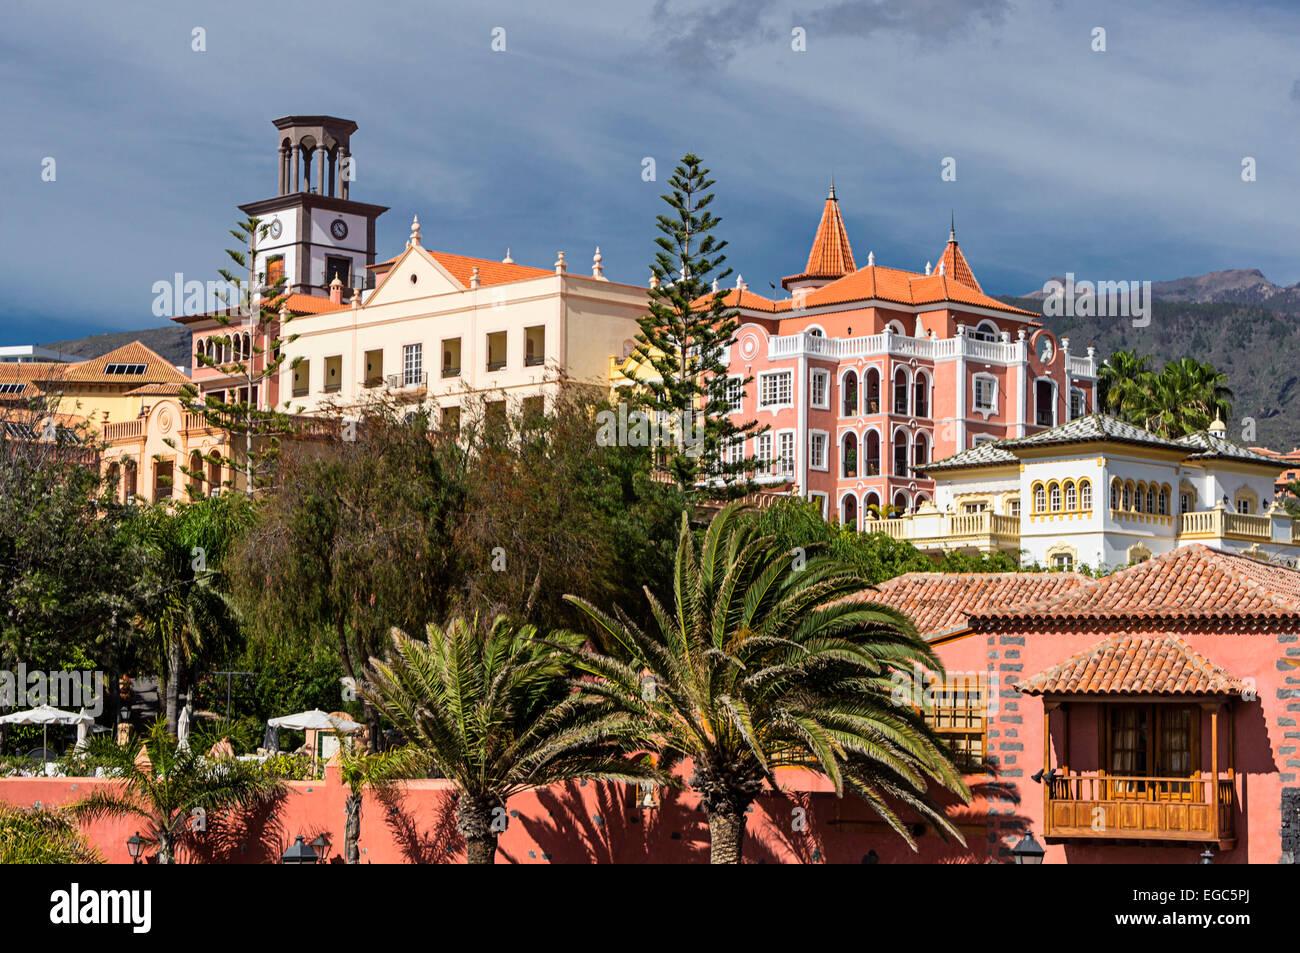 Gran Hotel Bahia Del Duque,  Resort, Tenerife, Spain - Stock Image